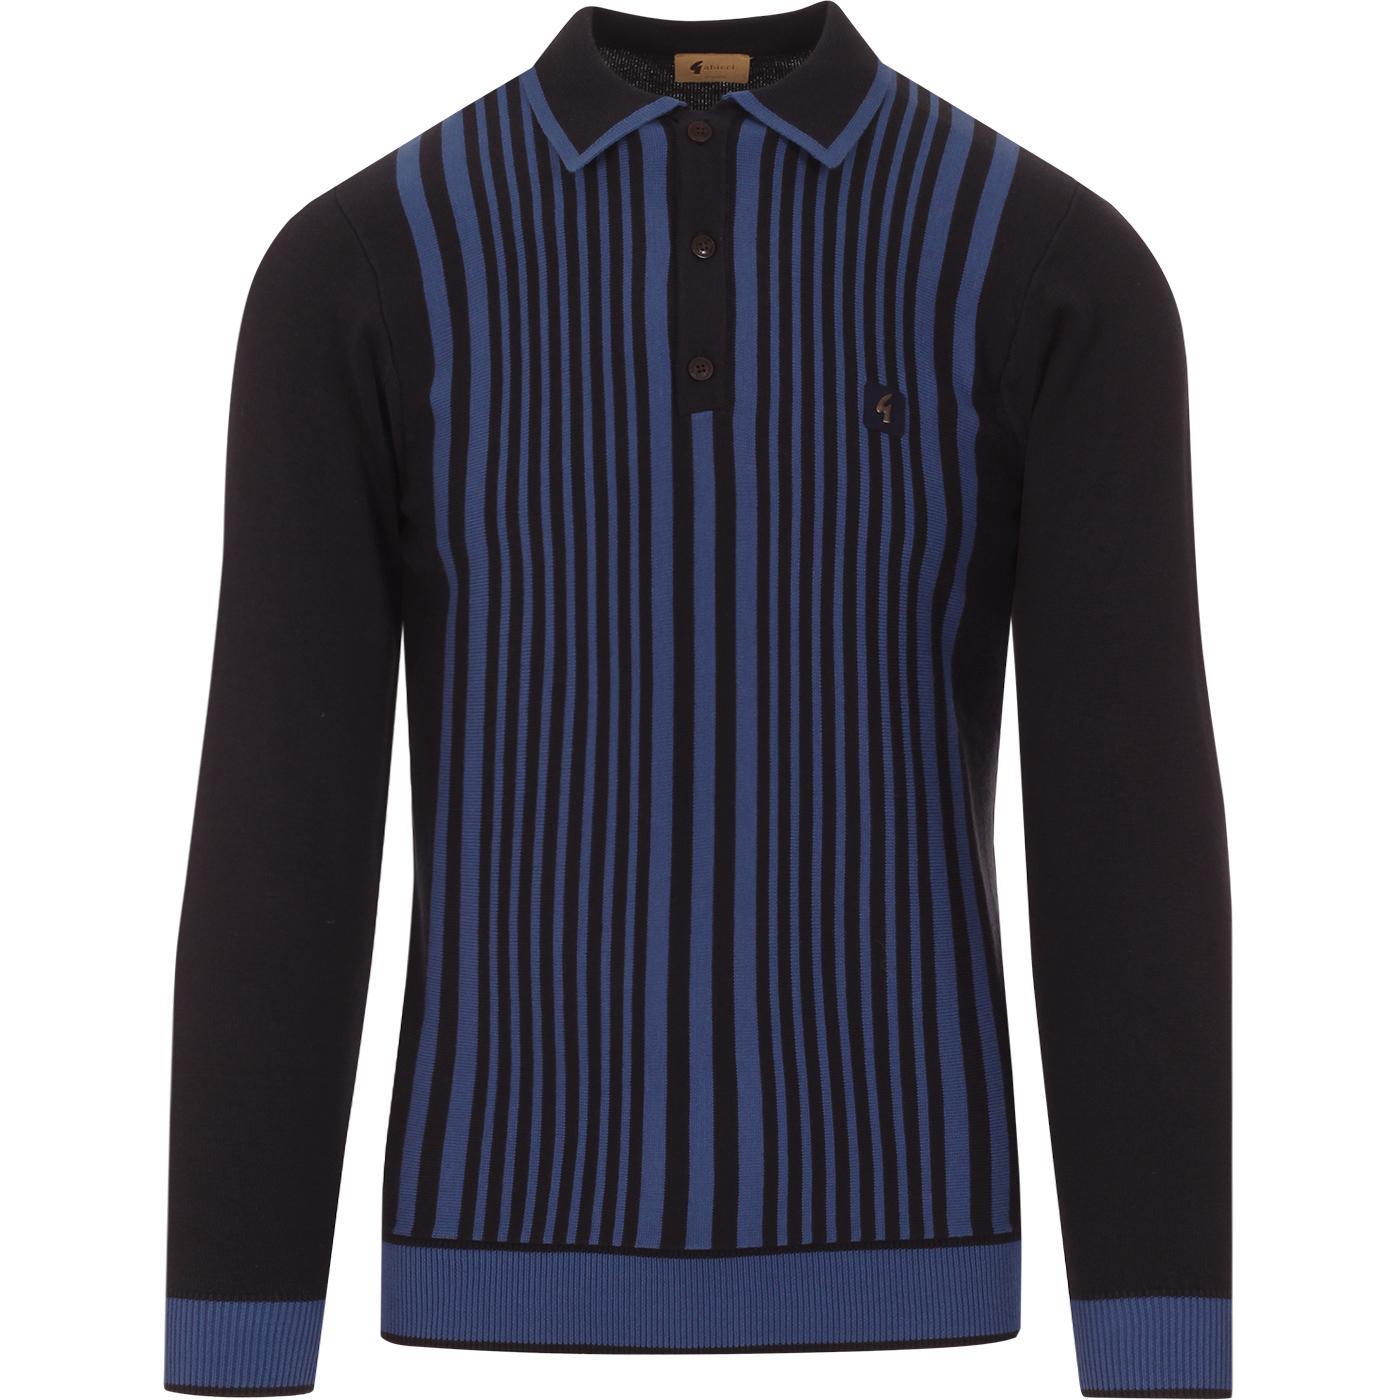 Strand GABICCI VINTAGE Mod Stripe Knitted Polo (N)